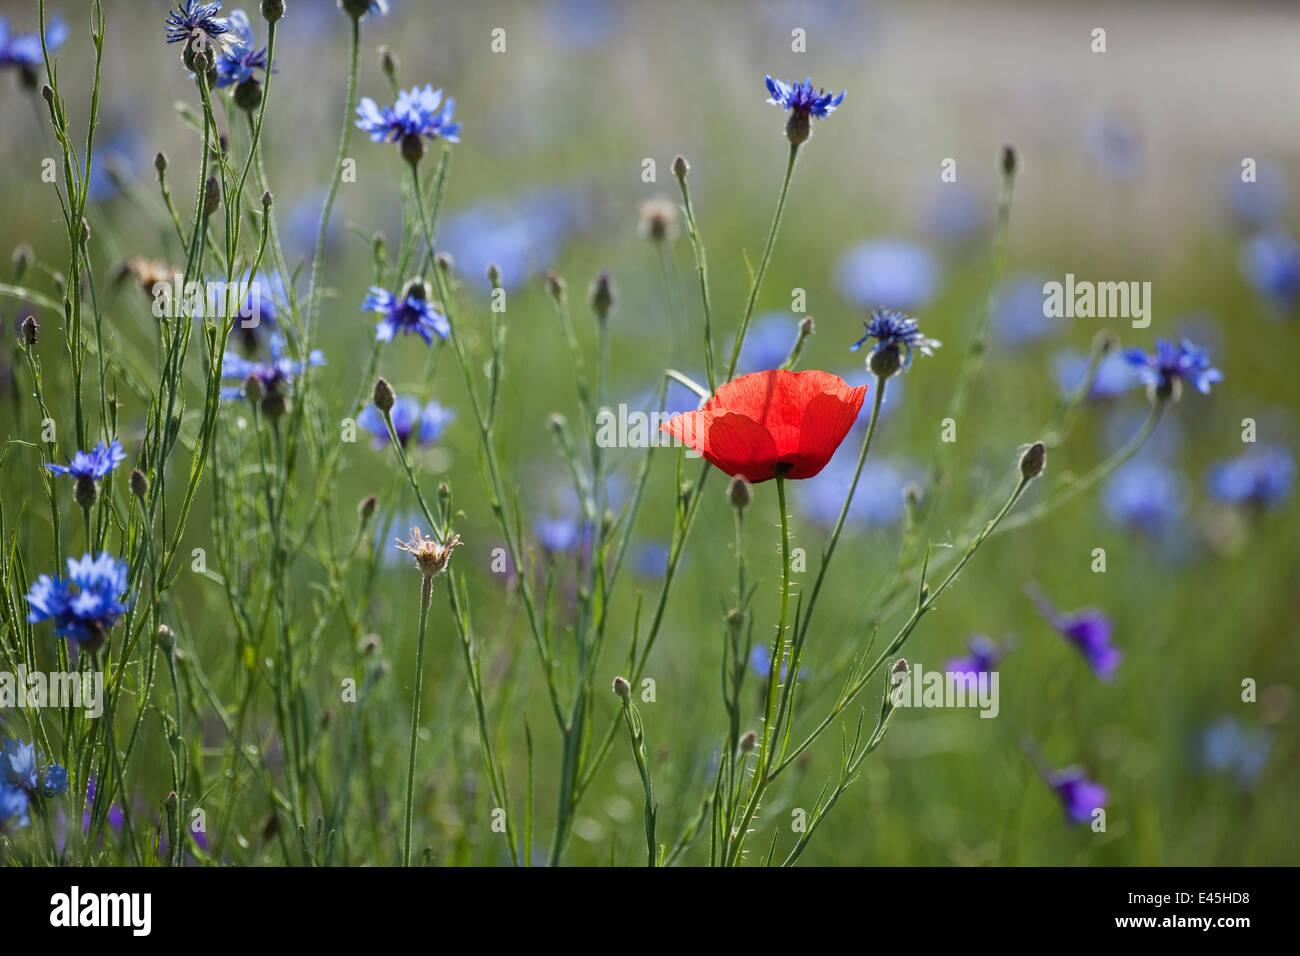 Red poppy (Papaver rhoeas) Brown knapweed (Centaurea jacea) and Forking larkspur (Delphinium / Consolida regalis) - Stock Image